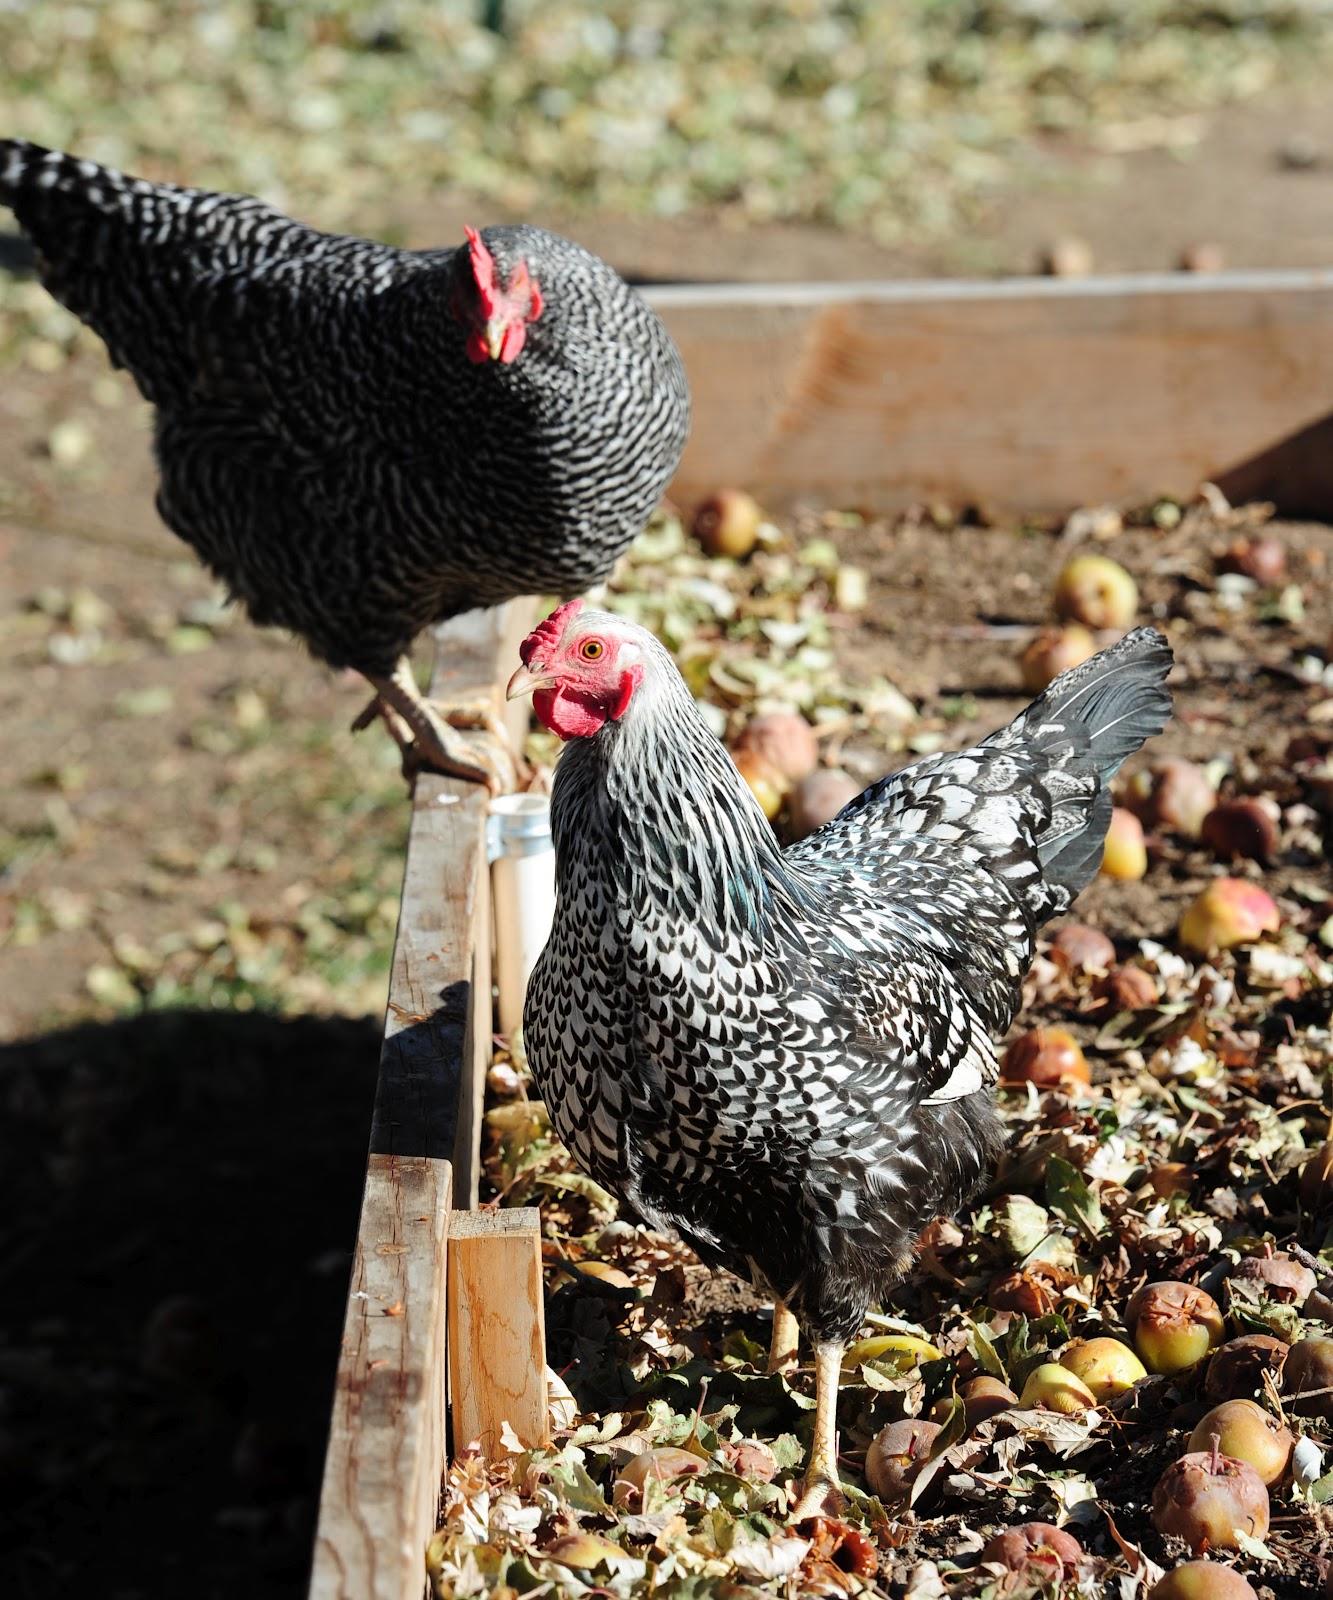 jeffco gardener caring for backyard chickens by elizabeth buckingham